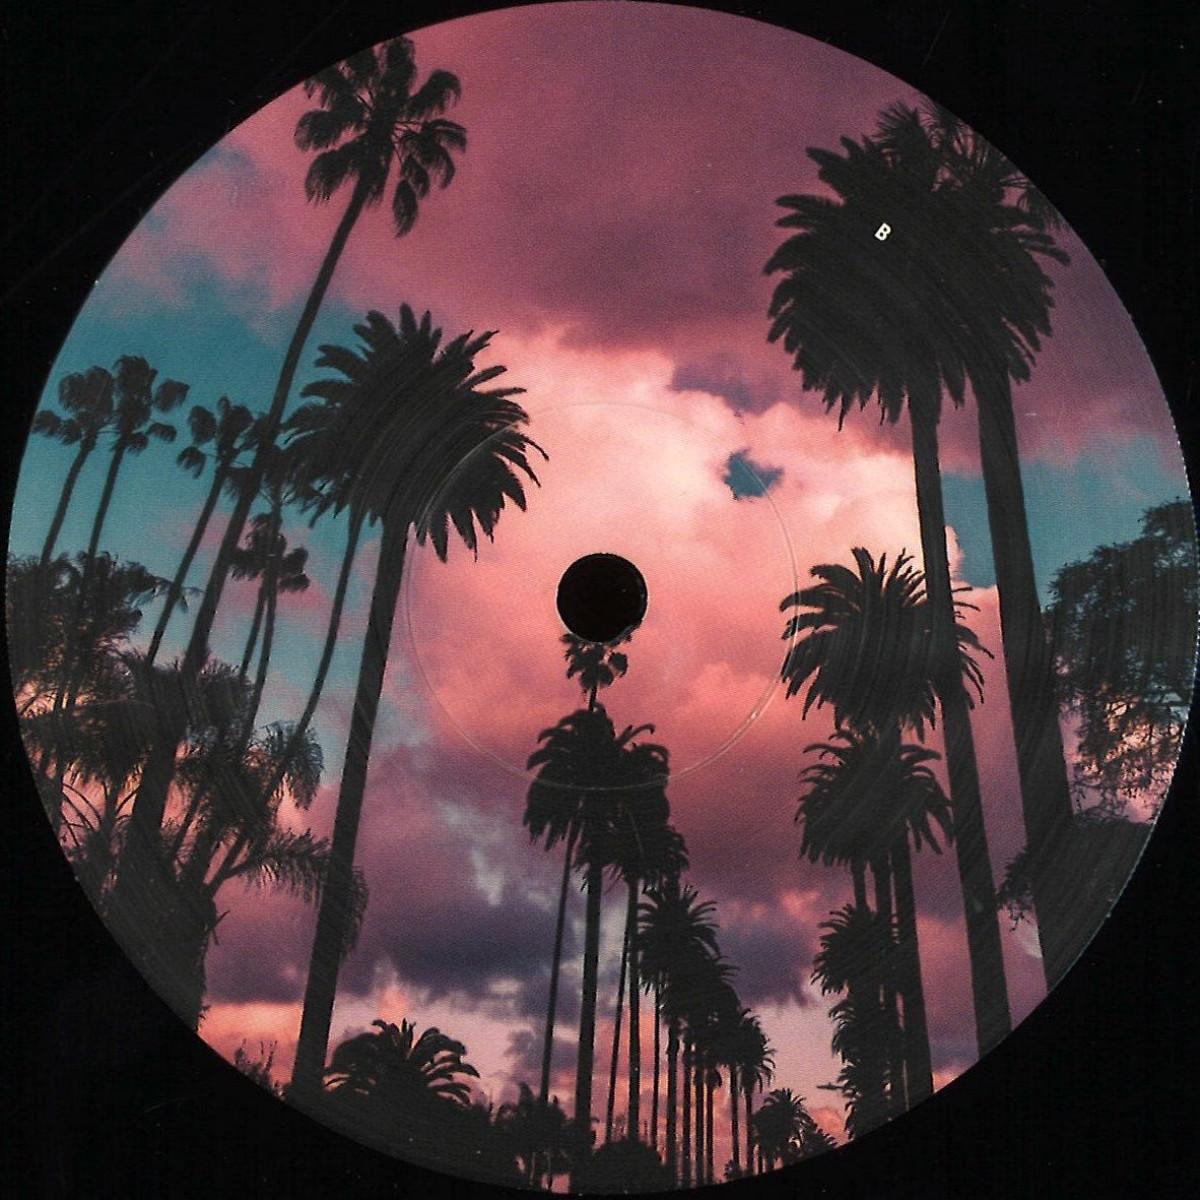 Tito Mazzetta - Memories of Tomorrow EP [Stay Random Natasha] 01